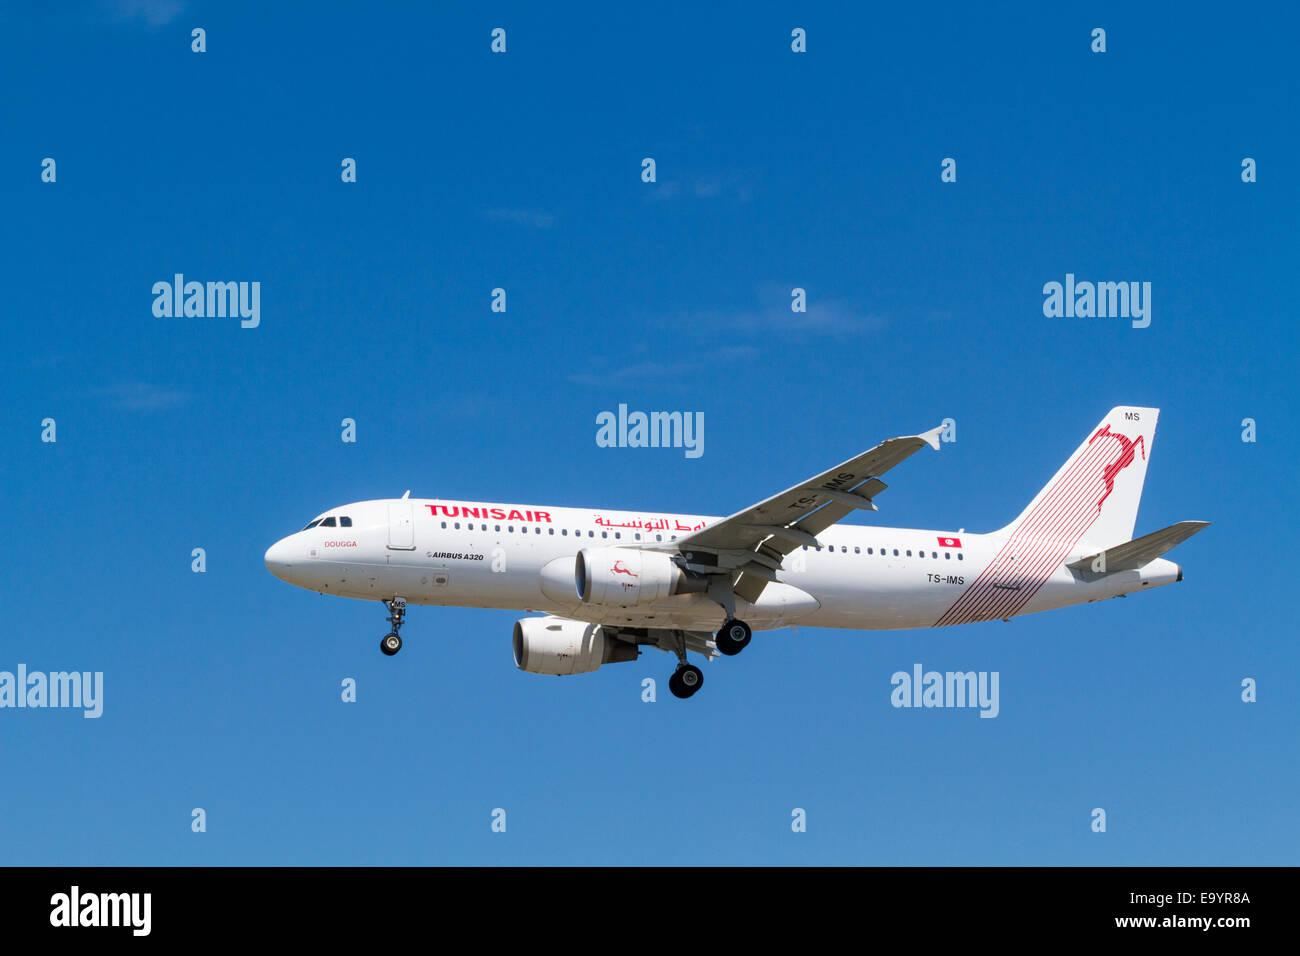 Tunisair Airbus A320-200, TS-IMS, named Dougga, on its landing approach at London Heathrow, England, UK - Stock Image